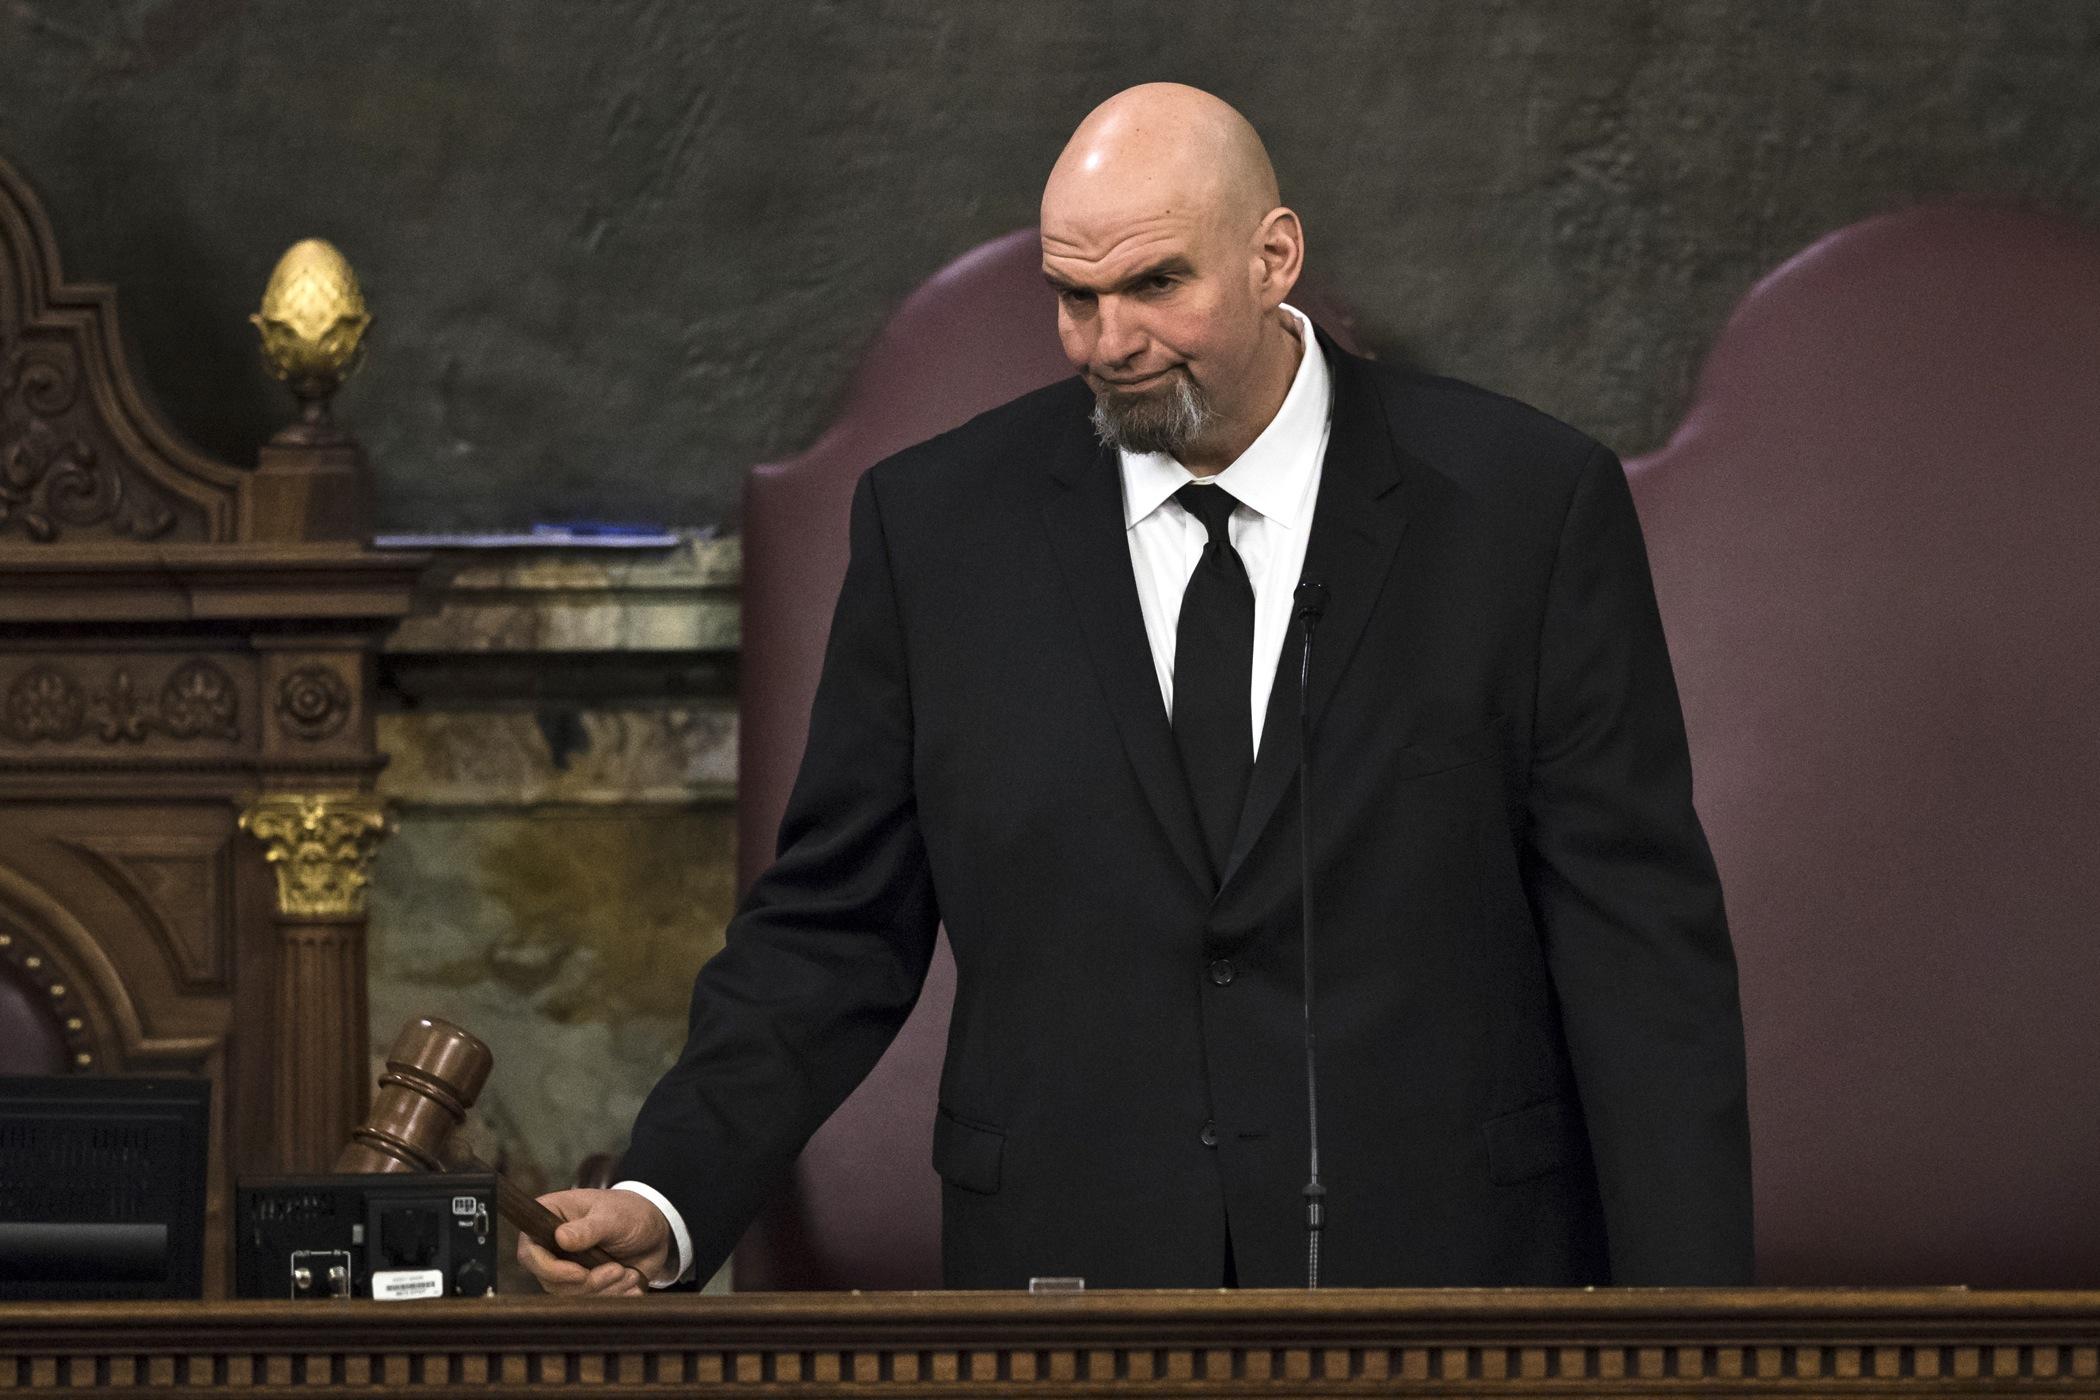 Lt. Gov. John Fetterman gavels in a joint session of the Pennsylvania House and Senate